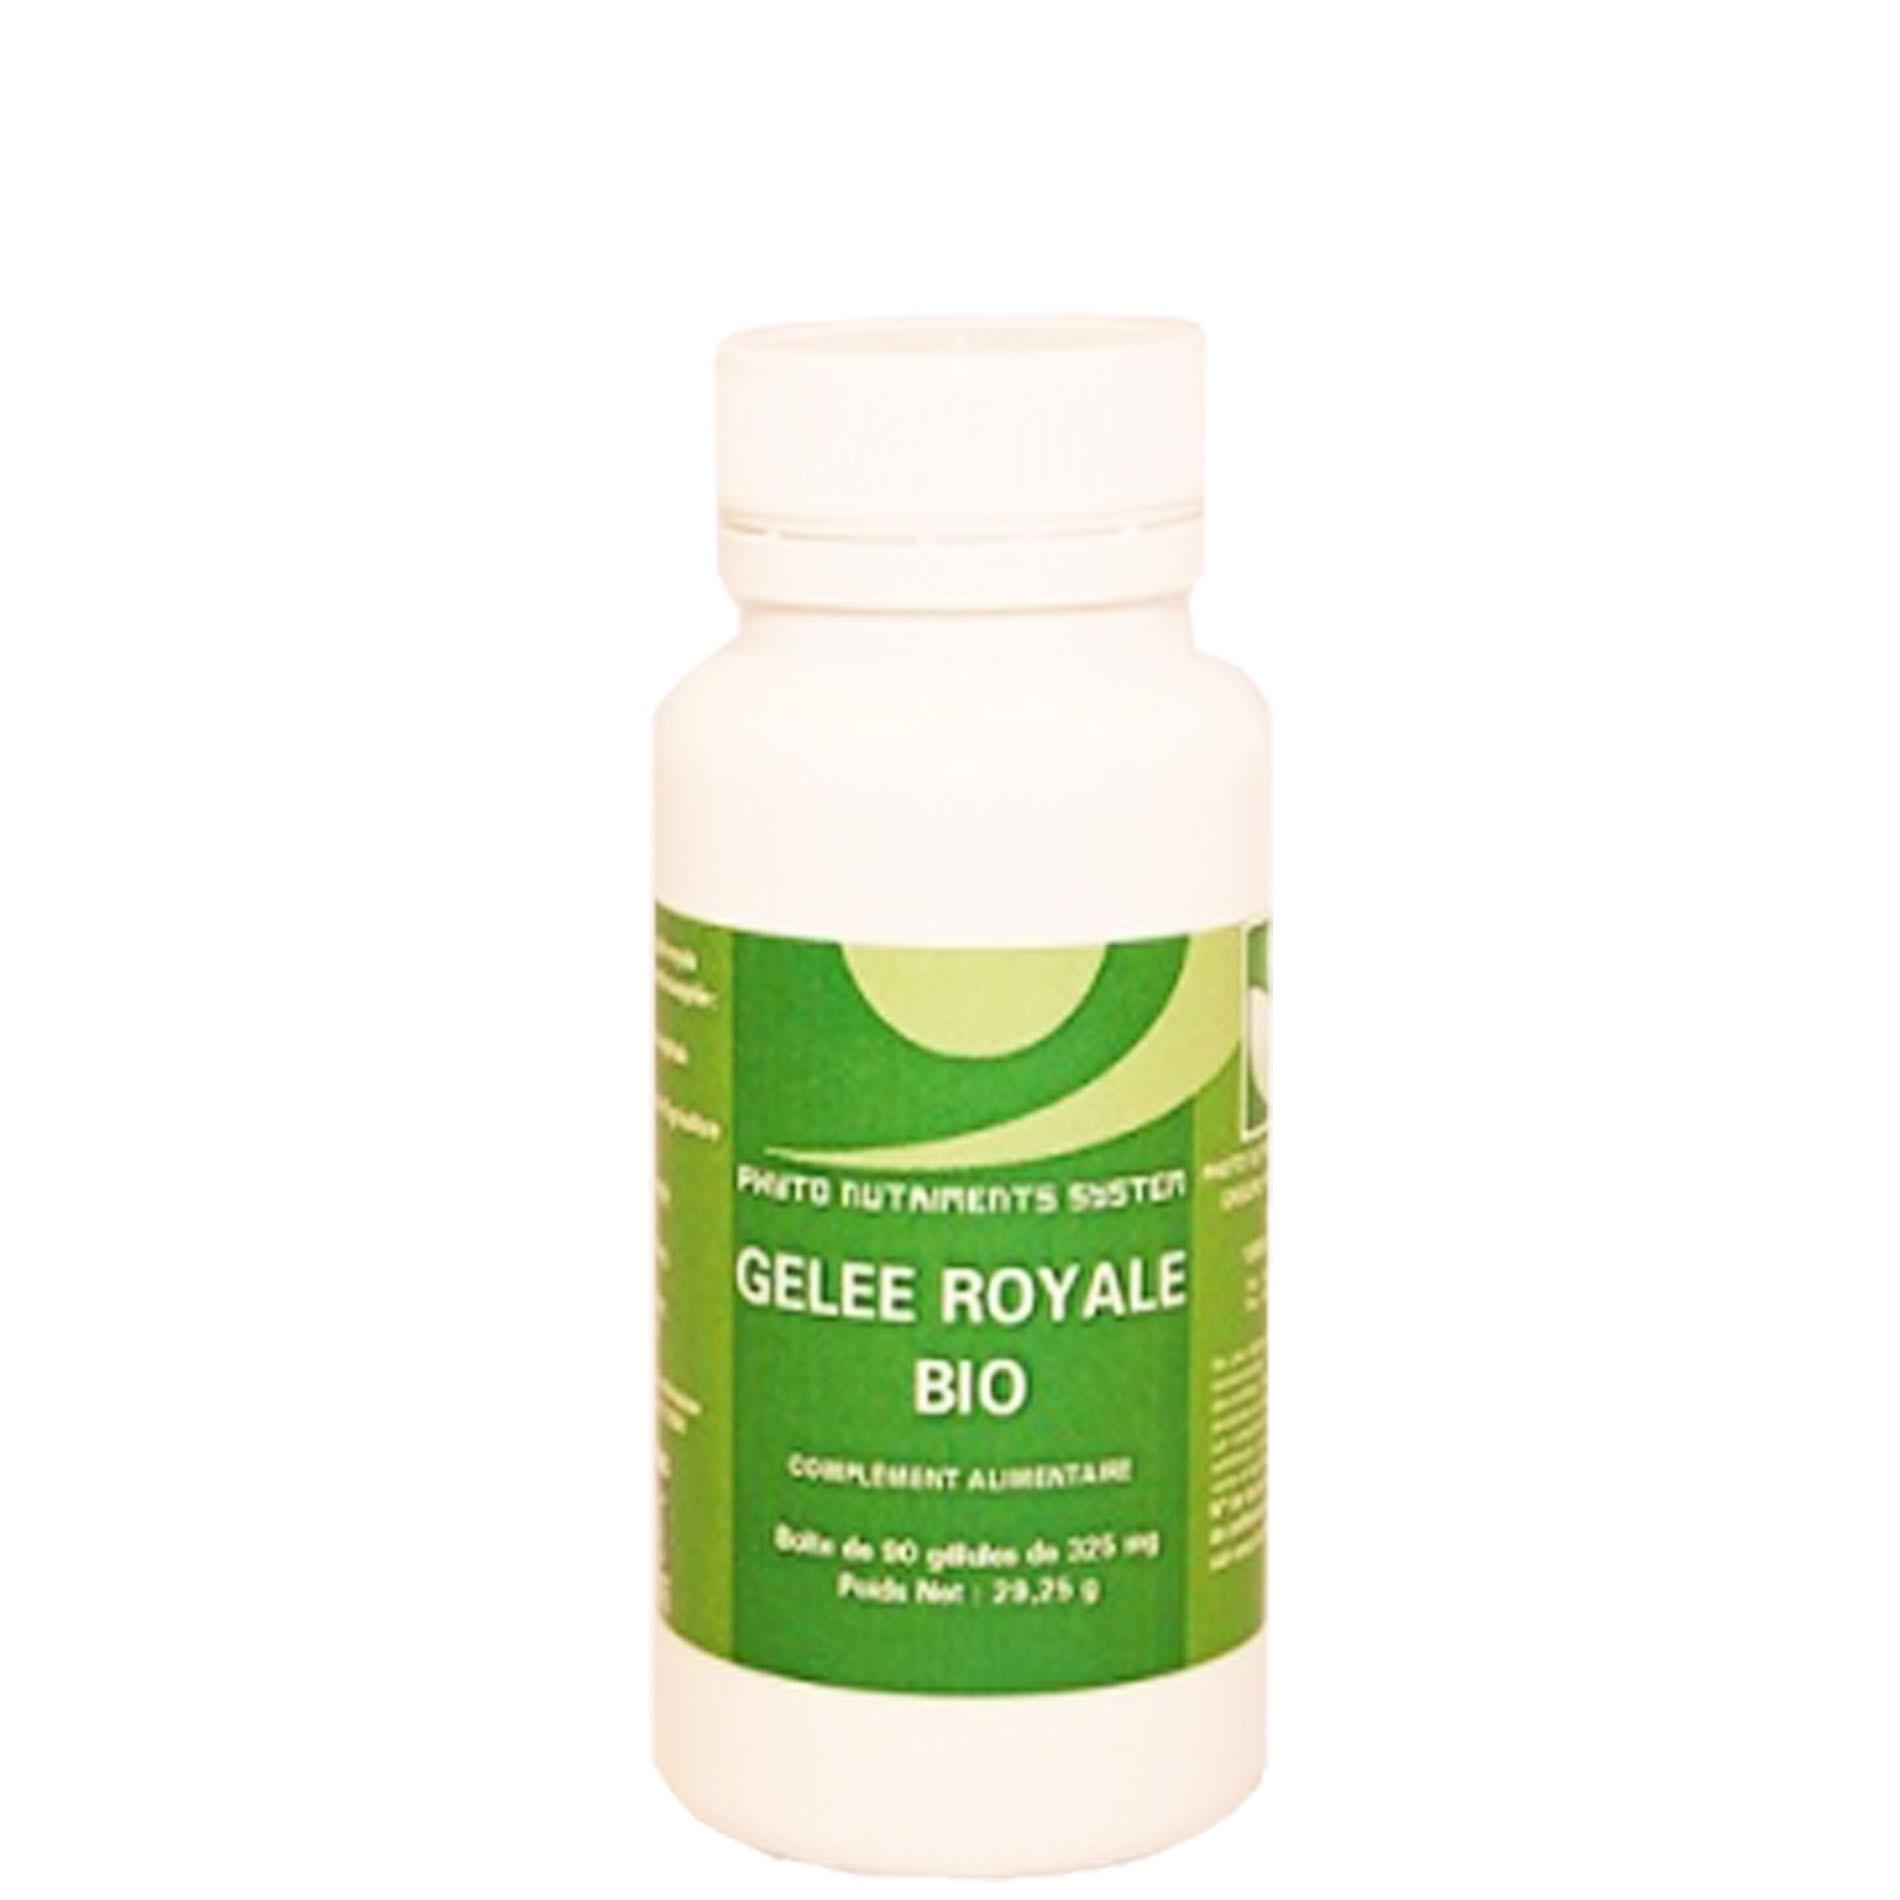 phytotherapie-gelee-royale-bio